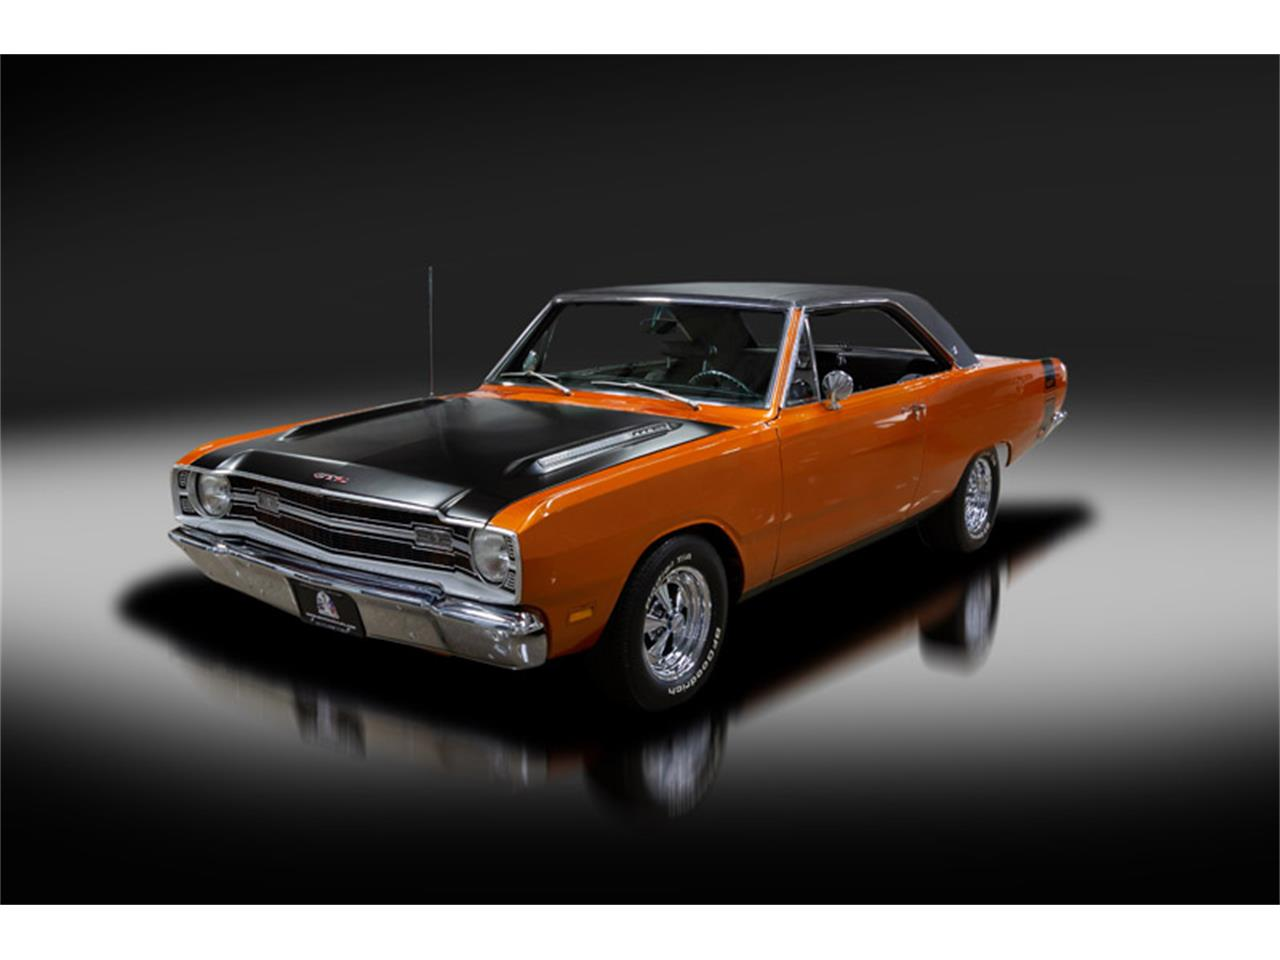 1969 Dodge Dart For Sale Classiccars Com Cc 1186509